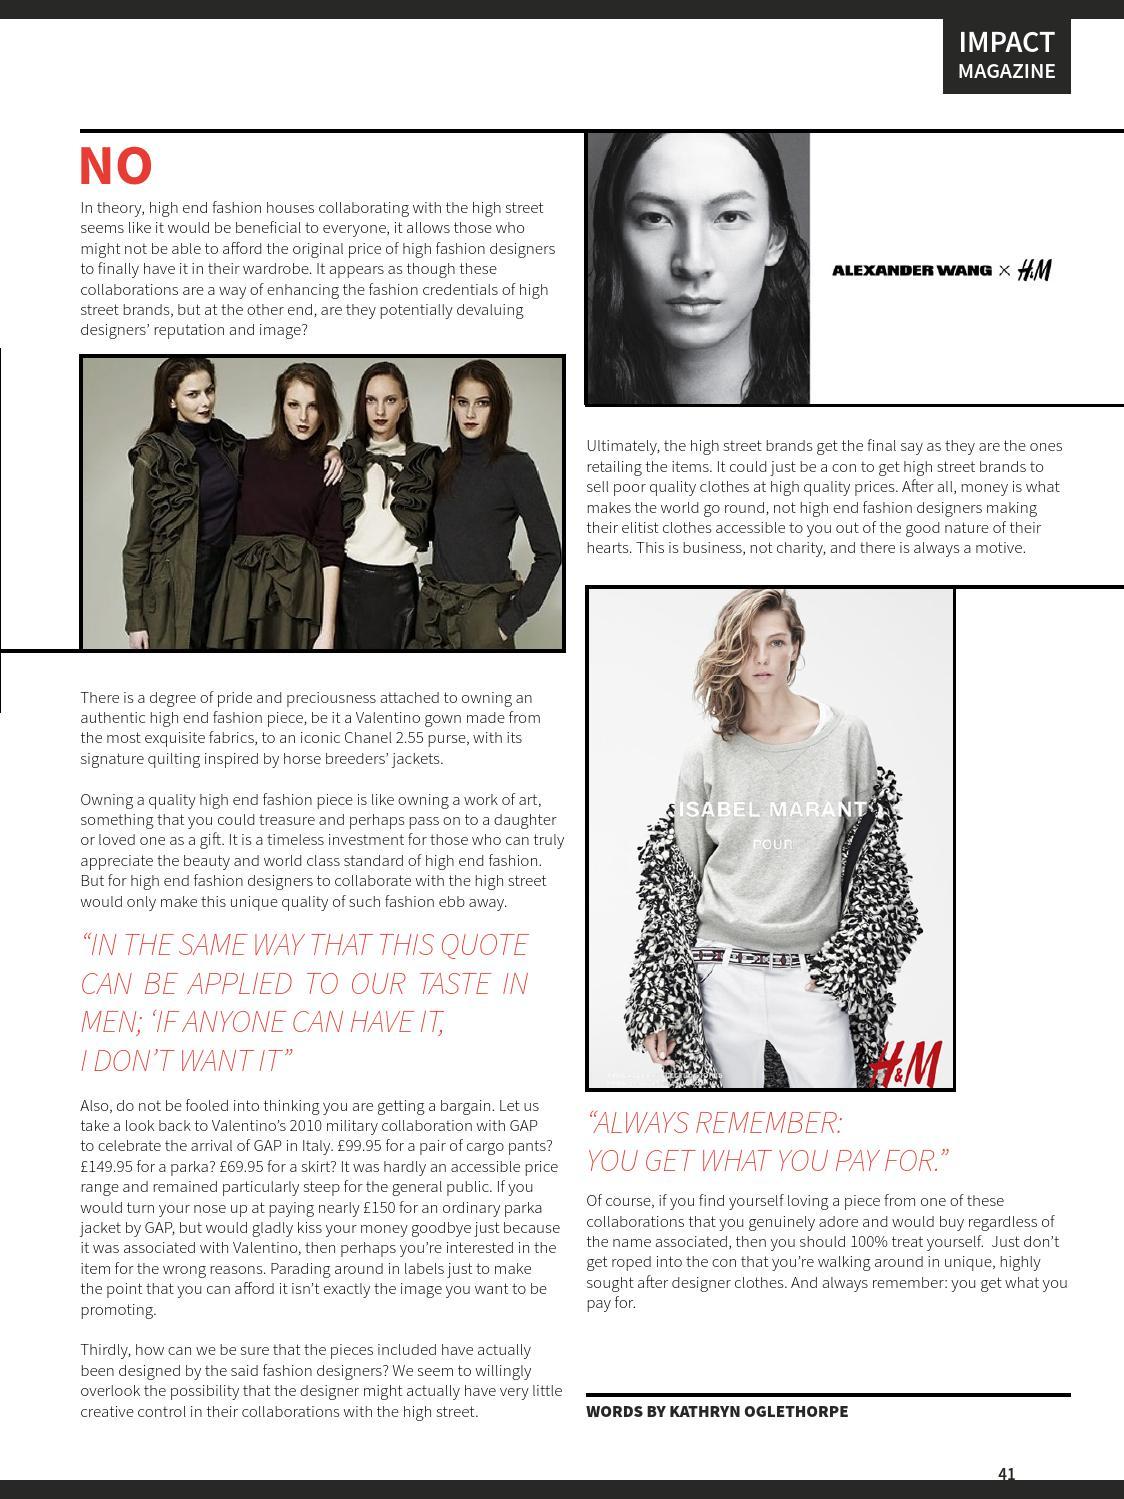 Impact Magazine Issue 233 by Impact Magazine - issuu